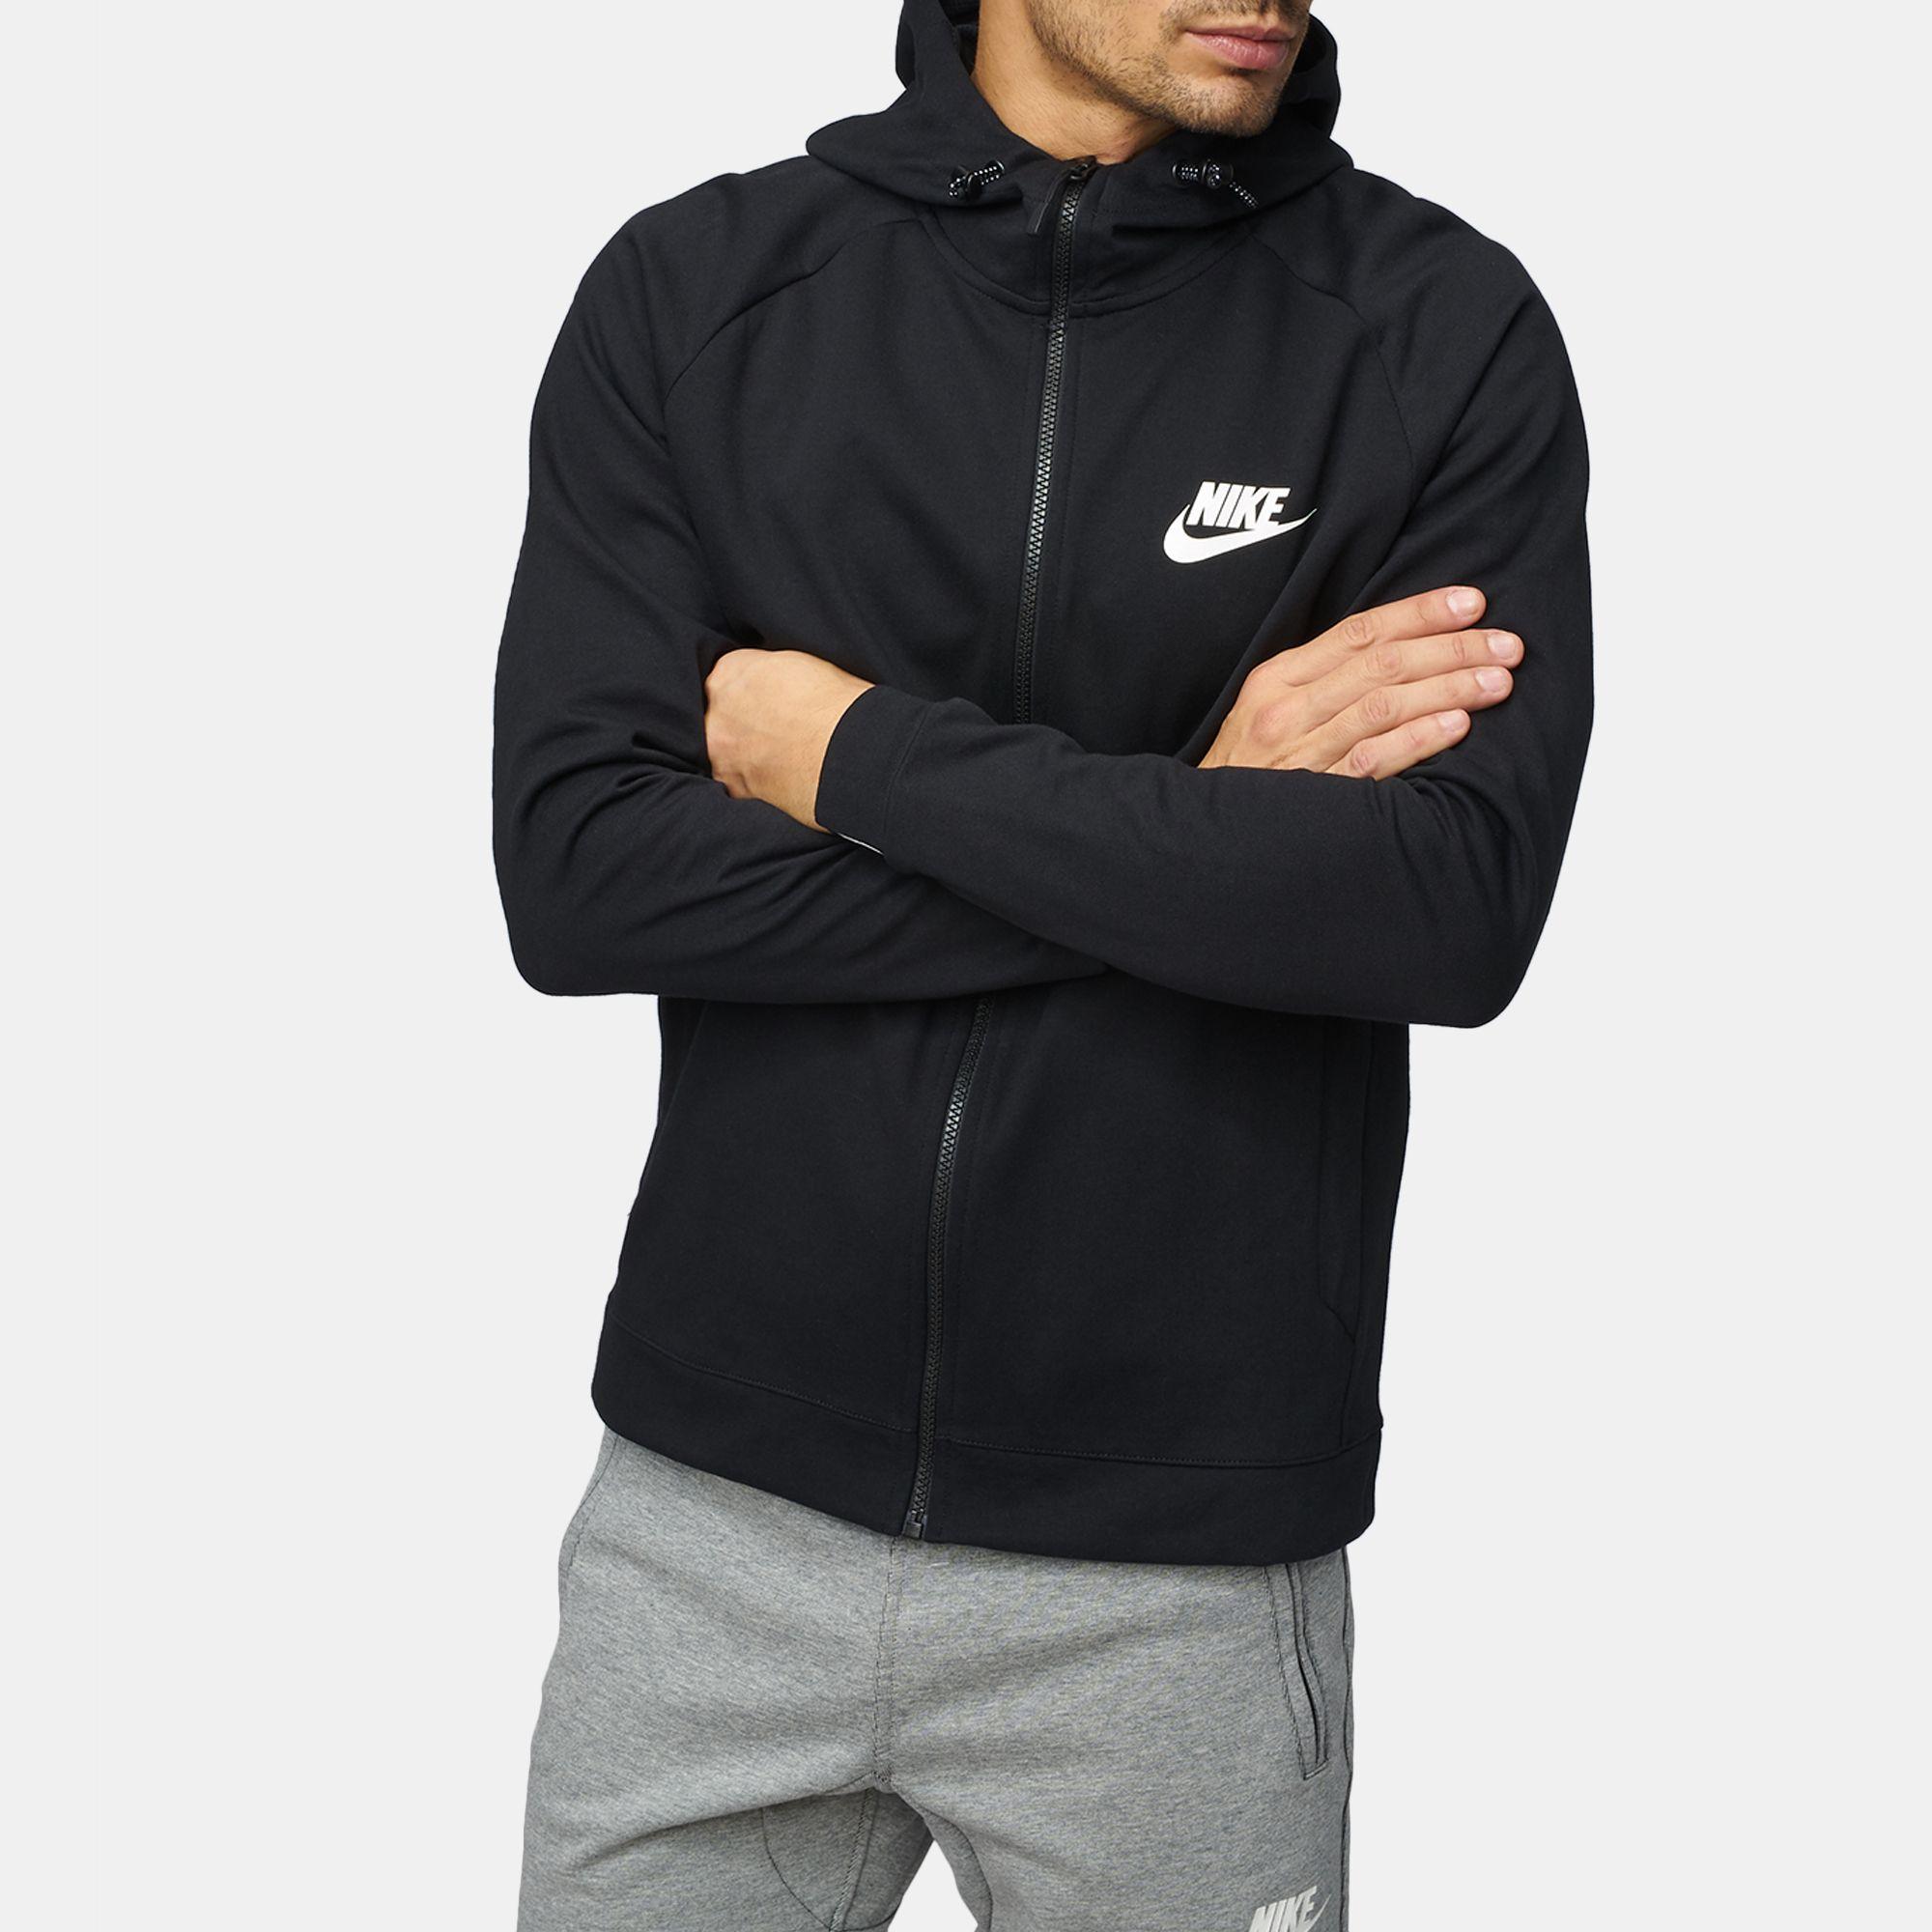 c98906e4 Nike Sportswear Advance 15 Hoodie | Hoodies | Hoodies and Sweatshirts |  Clothing | Men's Sale | KSA Sale | SSS